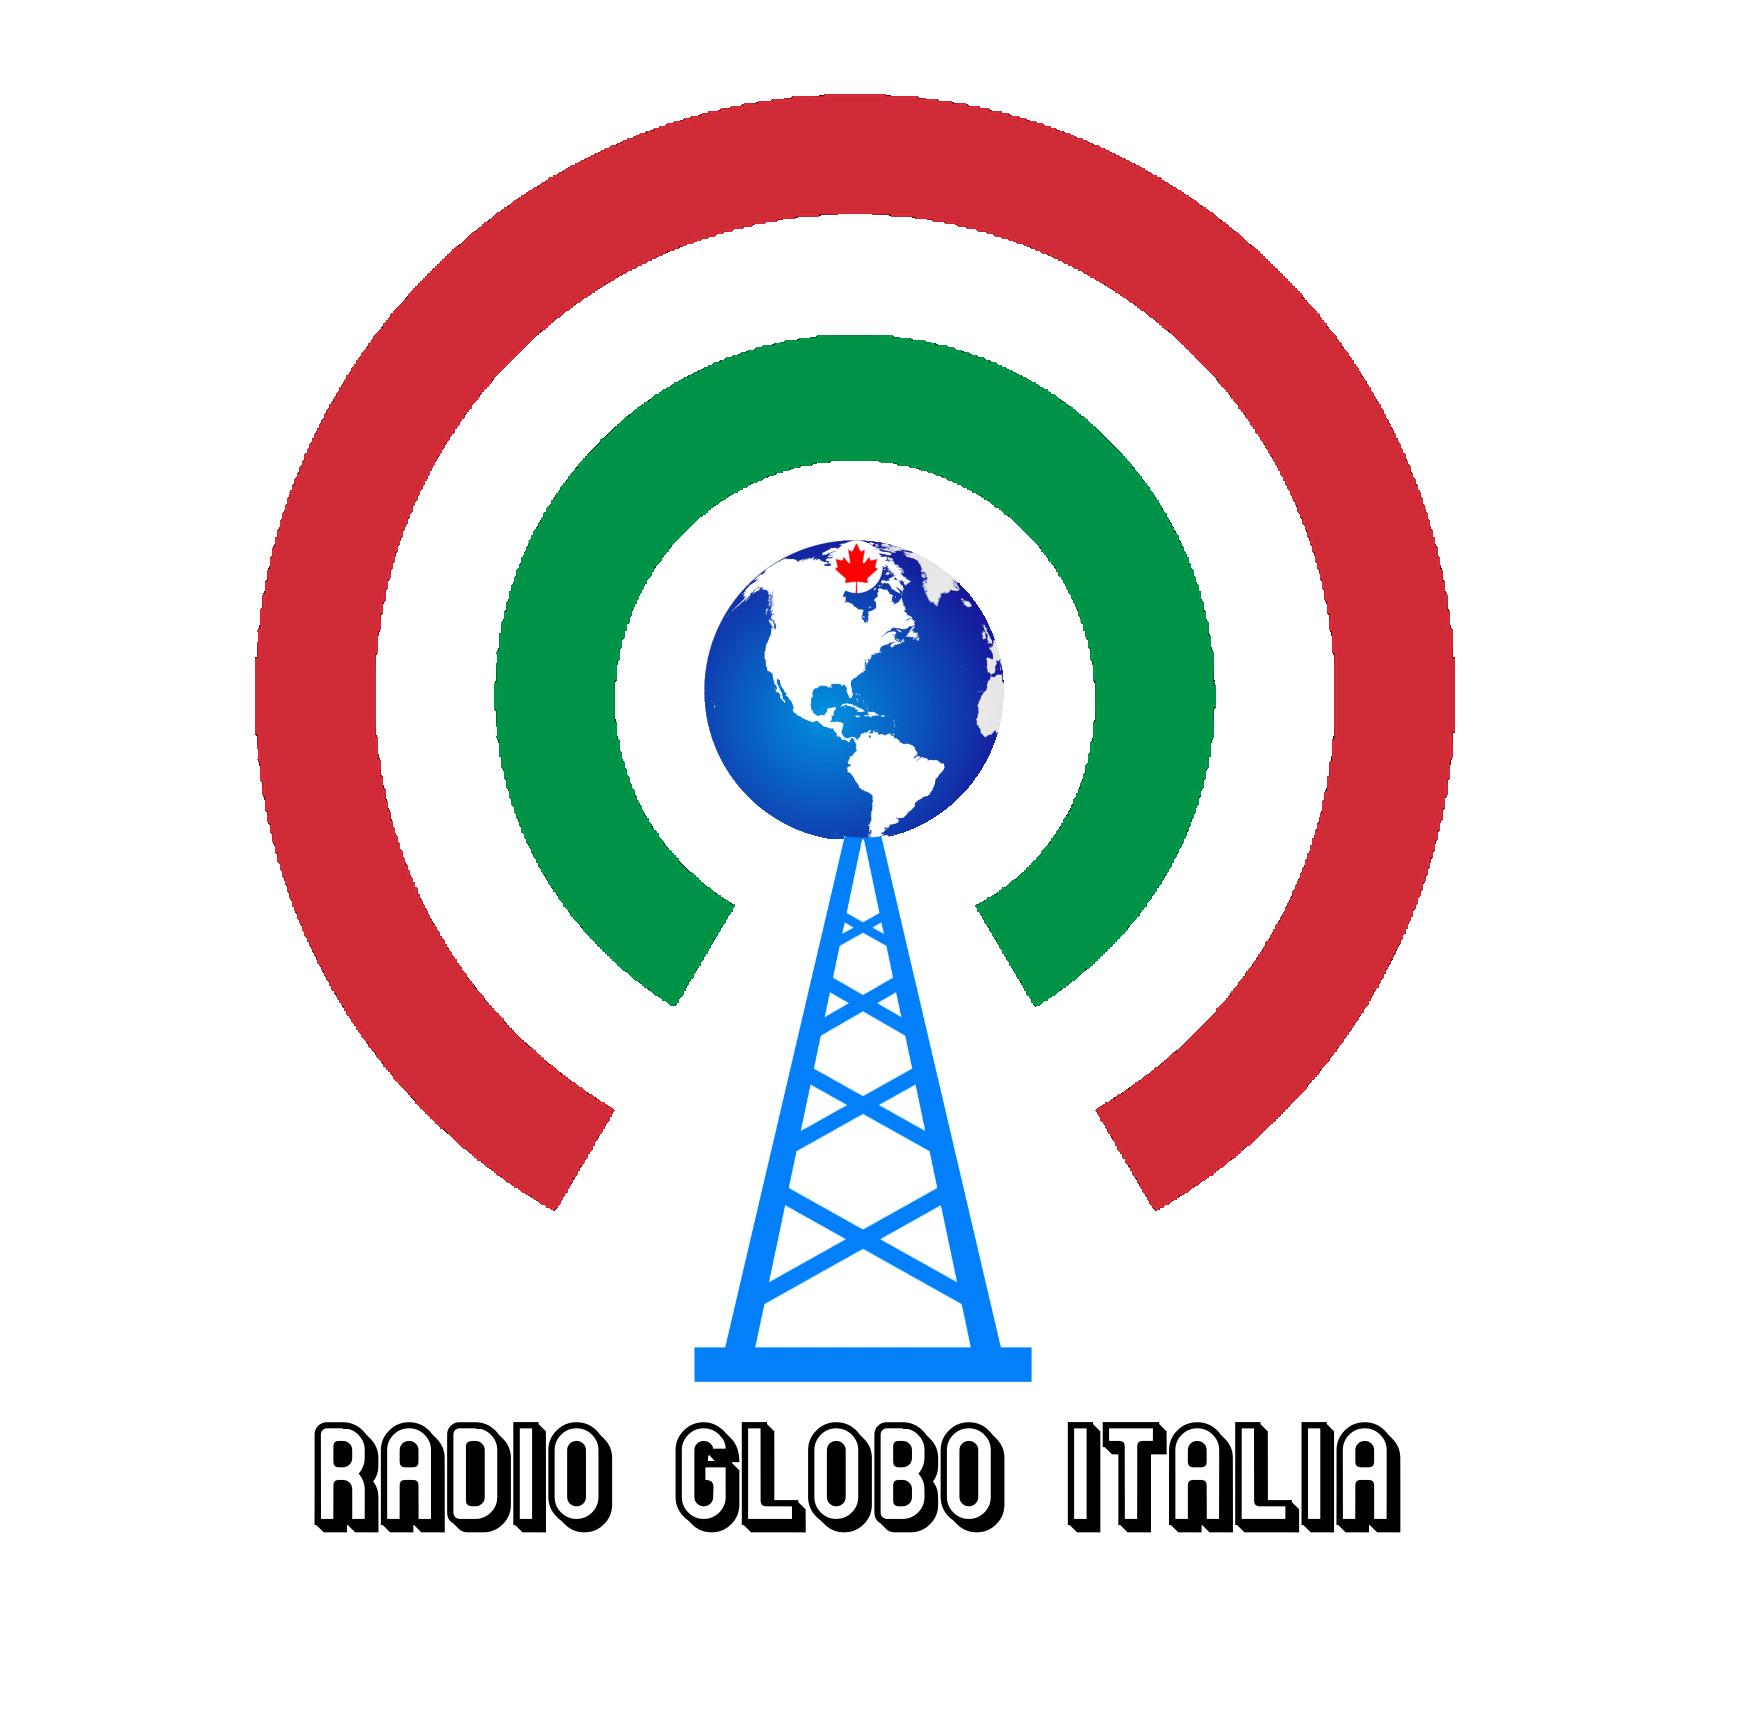 Radio Globo Italia